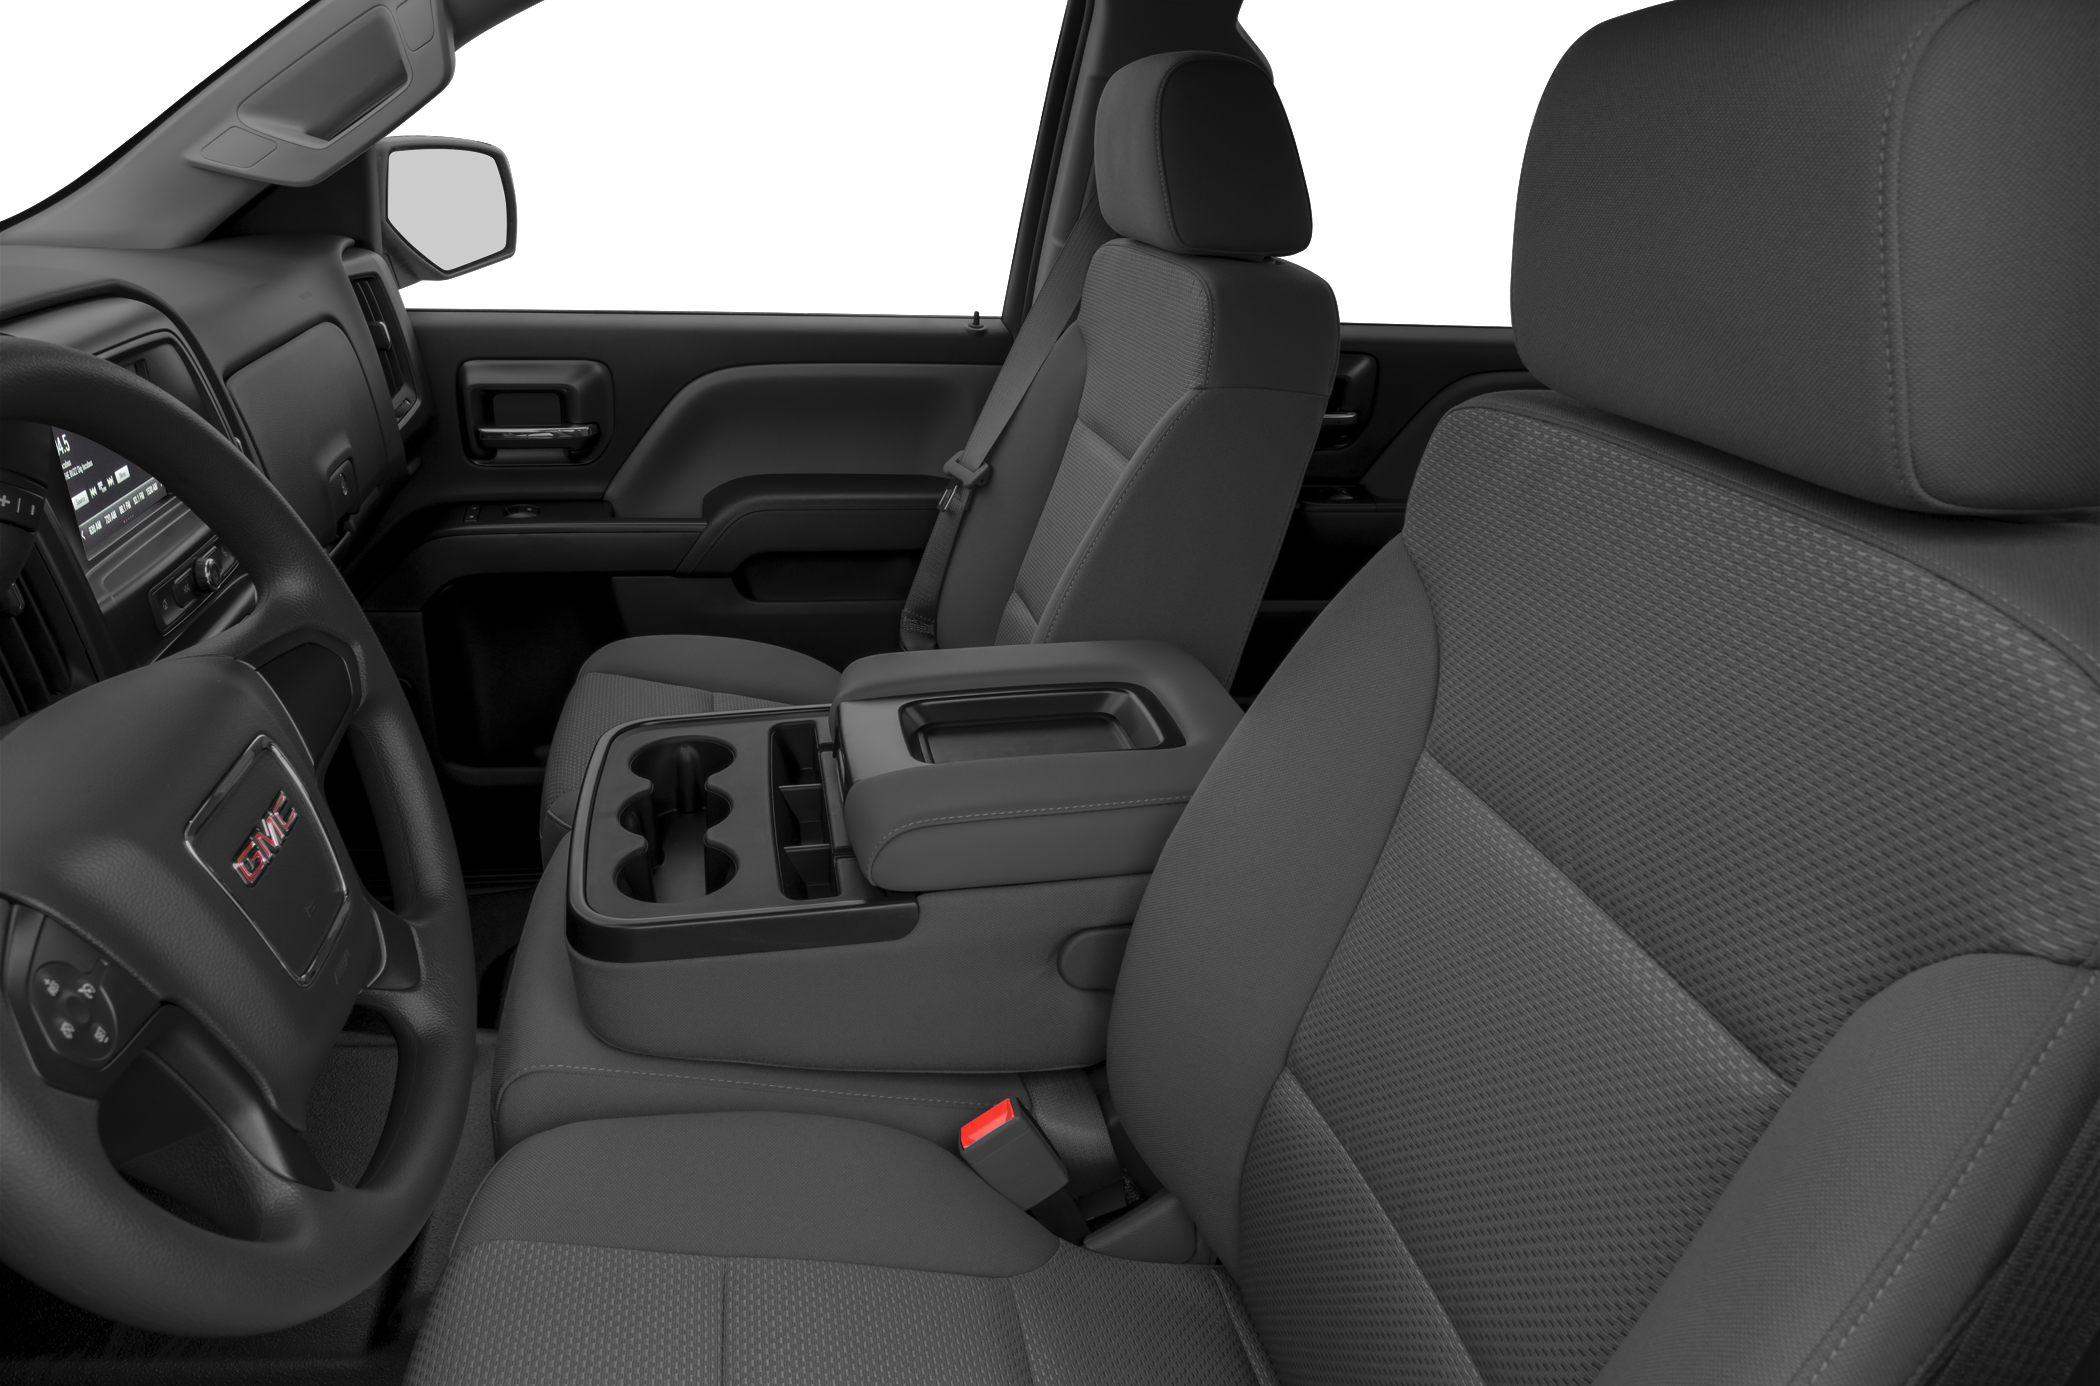 2017 Gmc Sierra 1500 Styles Features Highlights